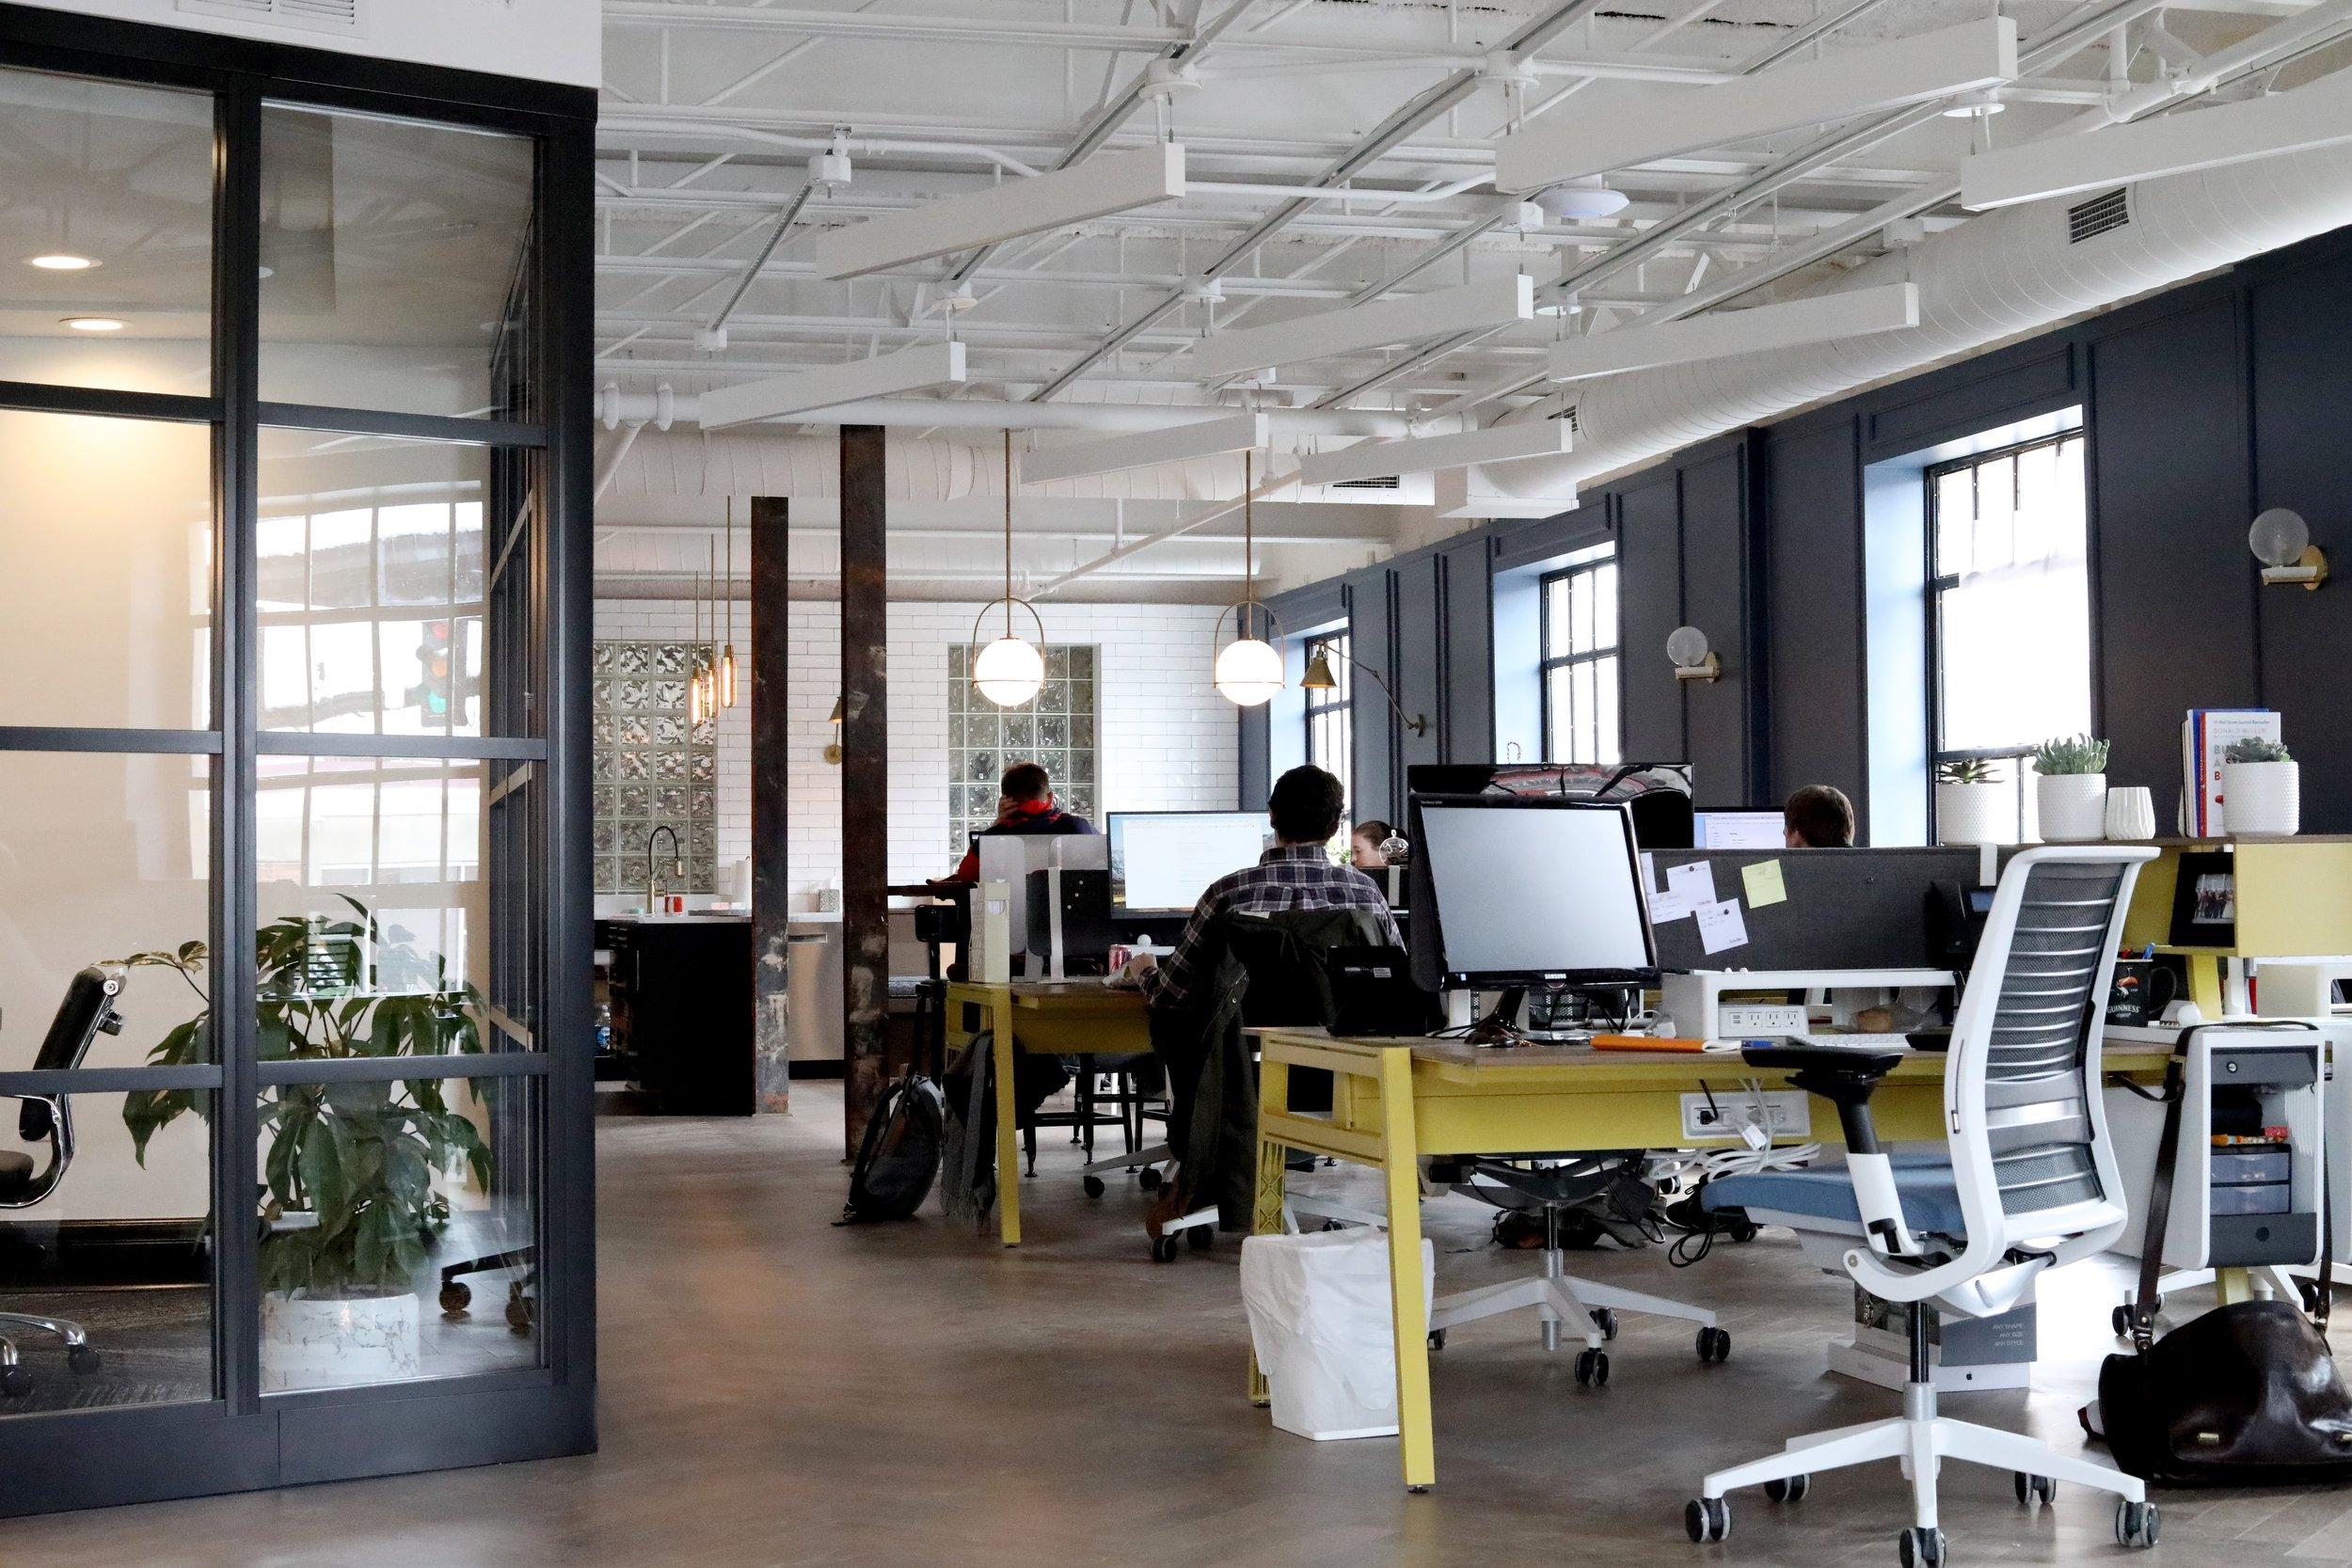 AETNA - Employees & Productivity